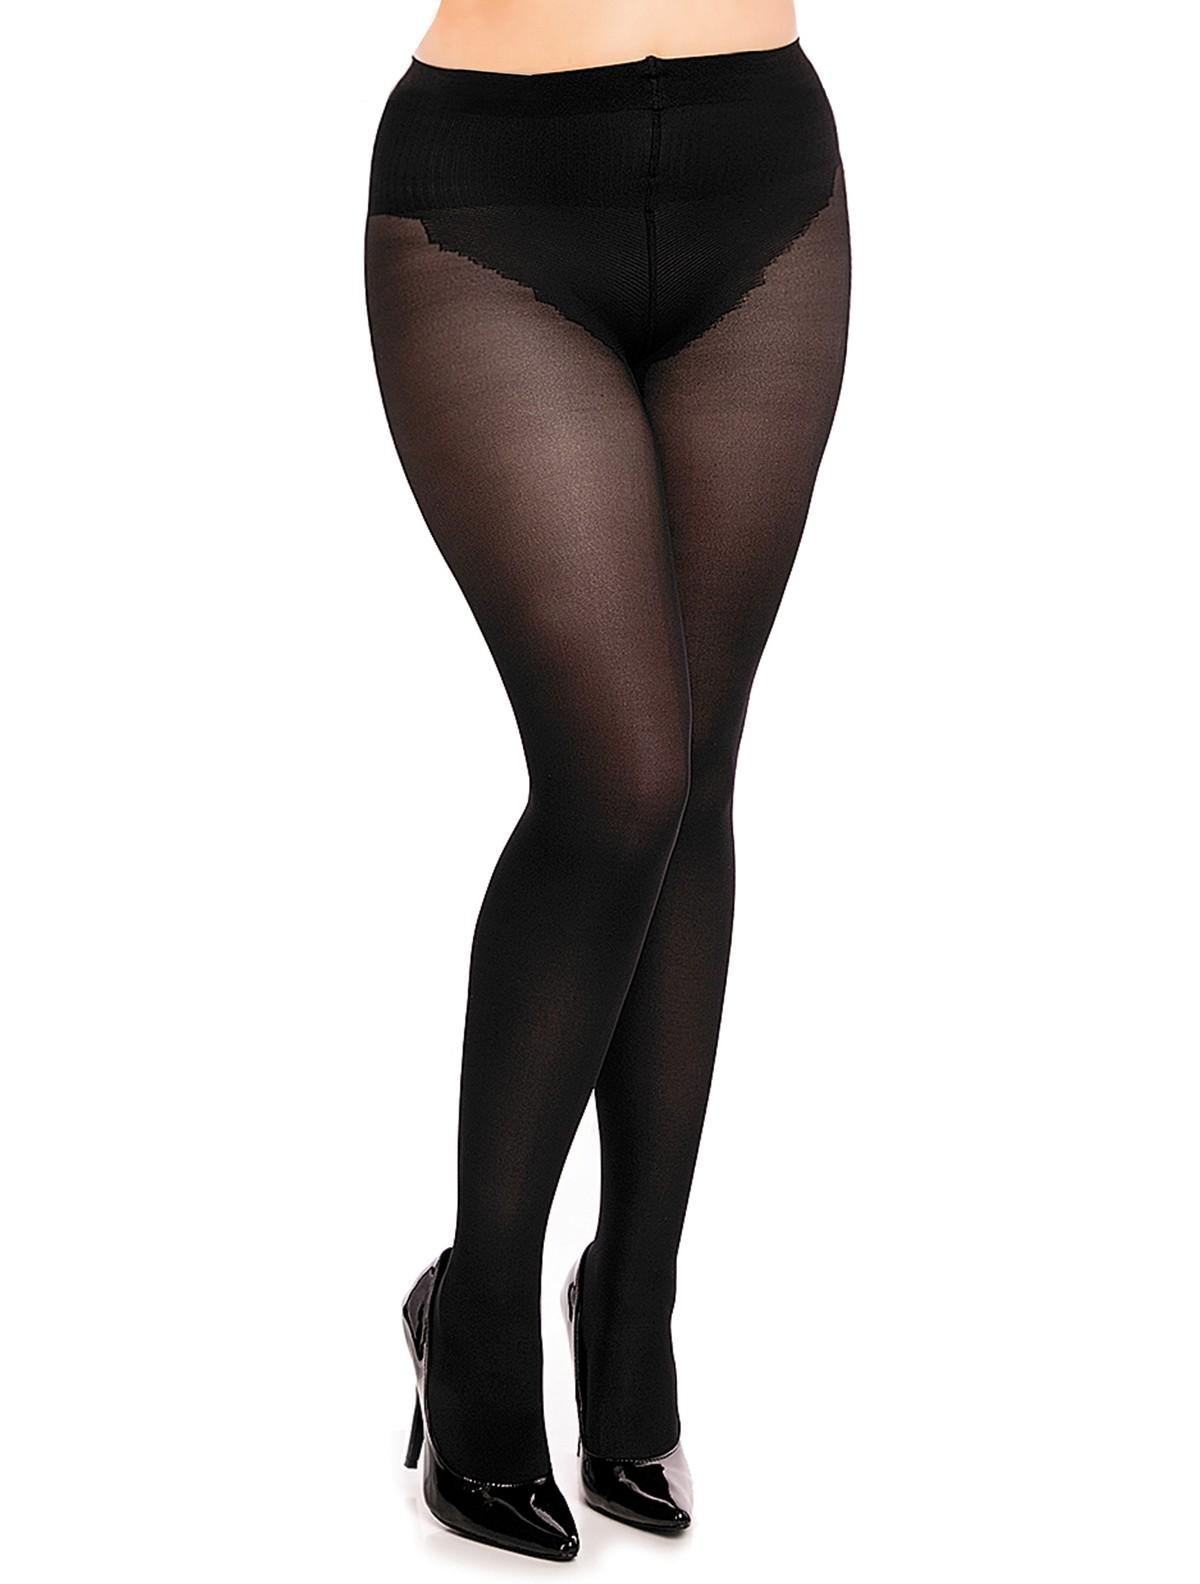 a0232b351c572 Glamory size silk skin shapewear tights black jpg 1200x1584 Shapewear and  stockings